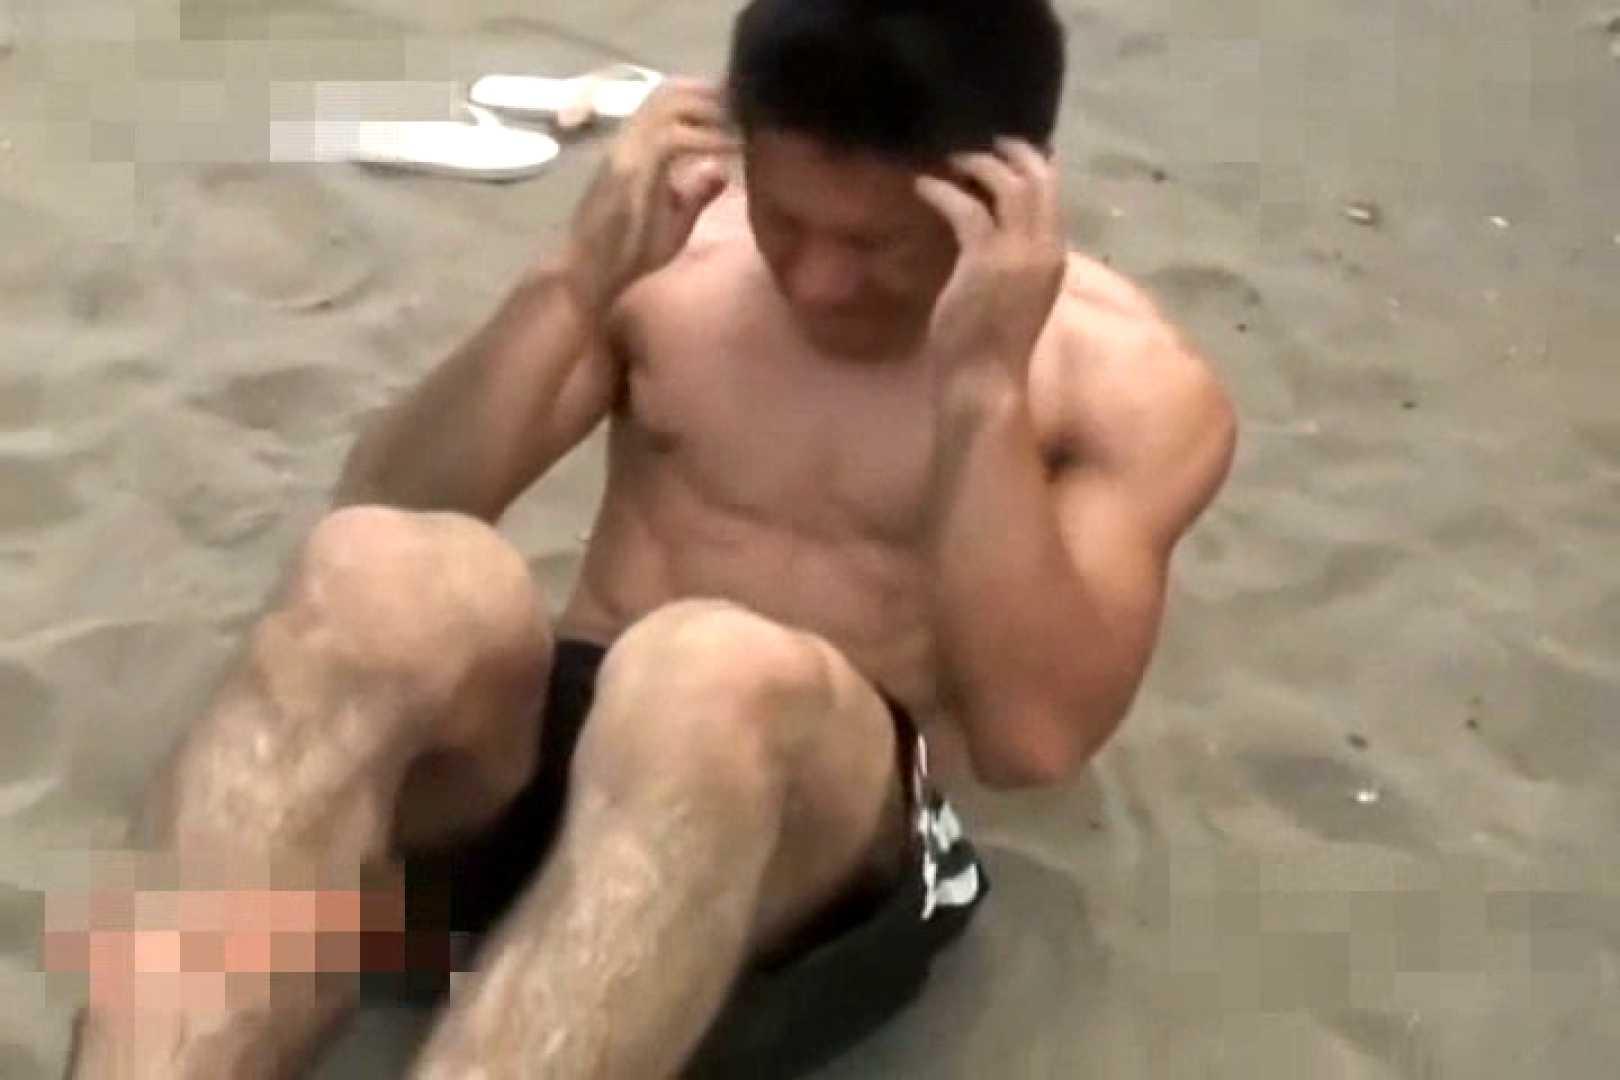 Beautiful muscle モッコリ野郎達!Vol.12 ガチムチマッチョ系 | オナニー特集  100pic 36